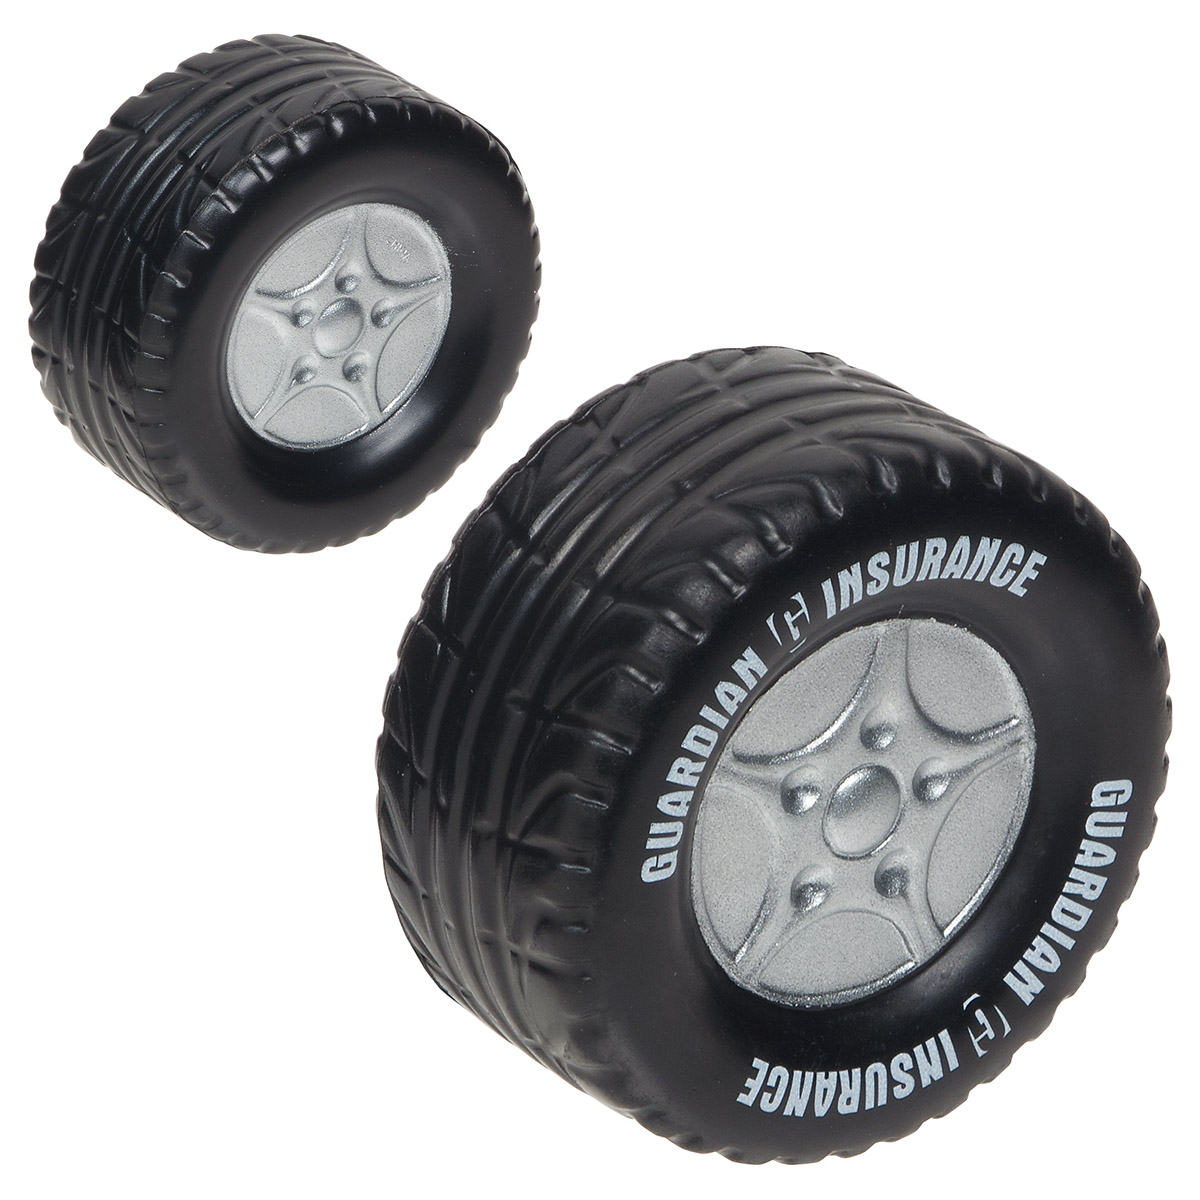 Tire Stress Reliever, LTR-TR15, 1 Colour Imprint